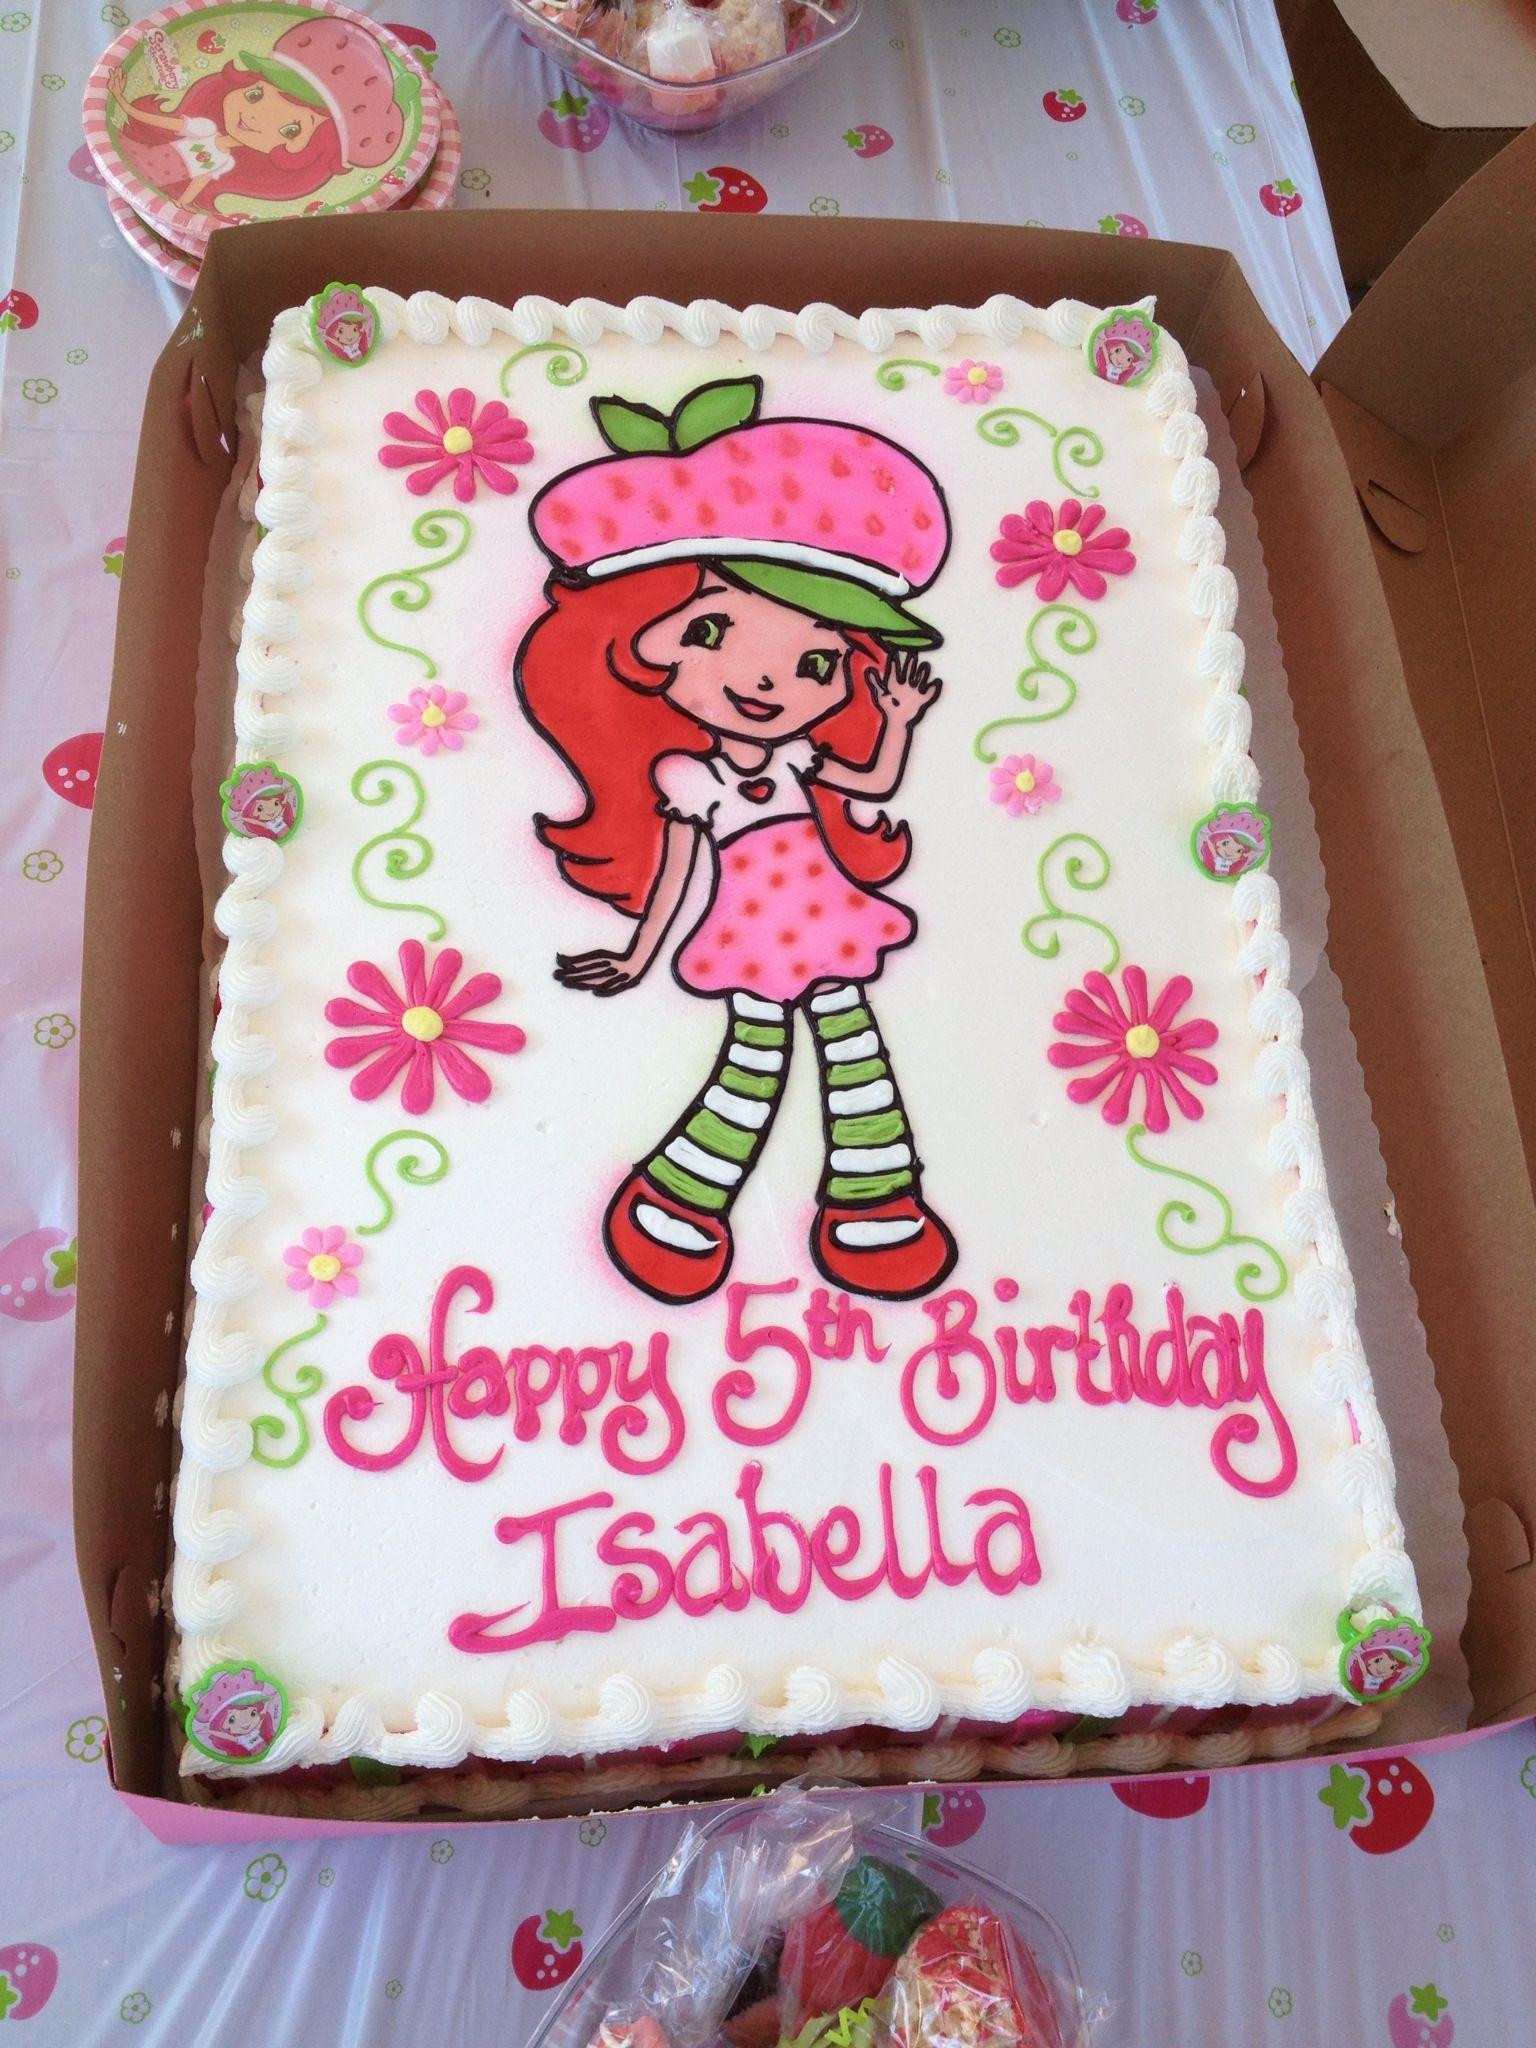 Admirable Strawberry Shortcake Birthday Cake Strawberry Shortcake Birthday Personalised Birthday Cards Veneteletsinfo